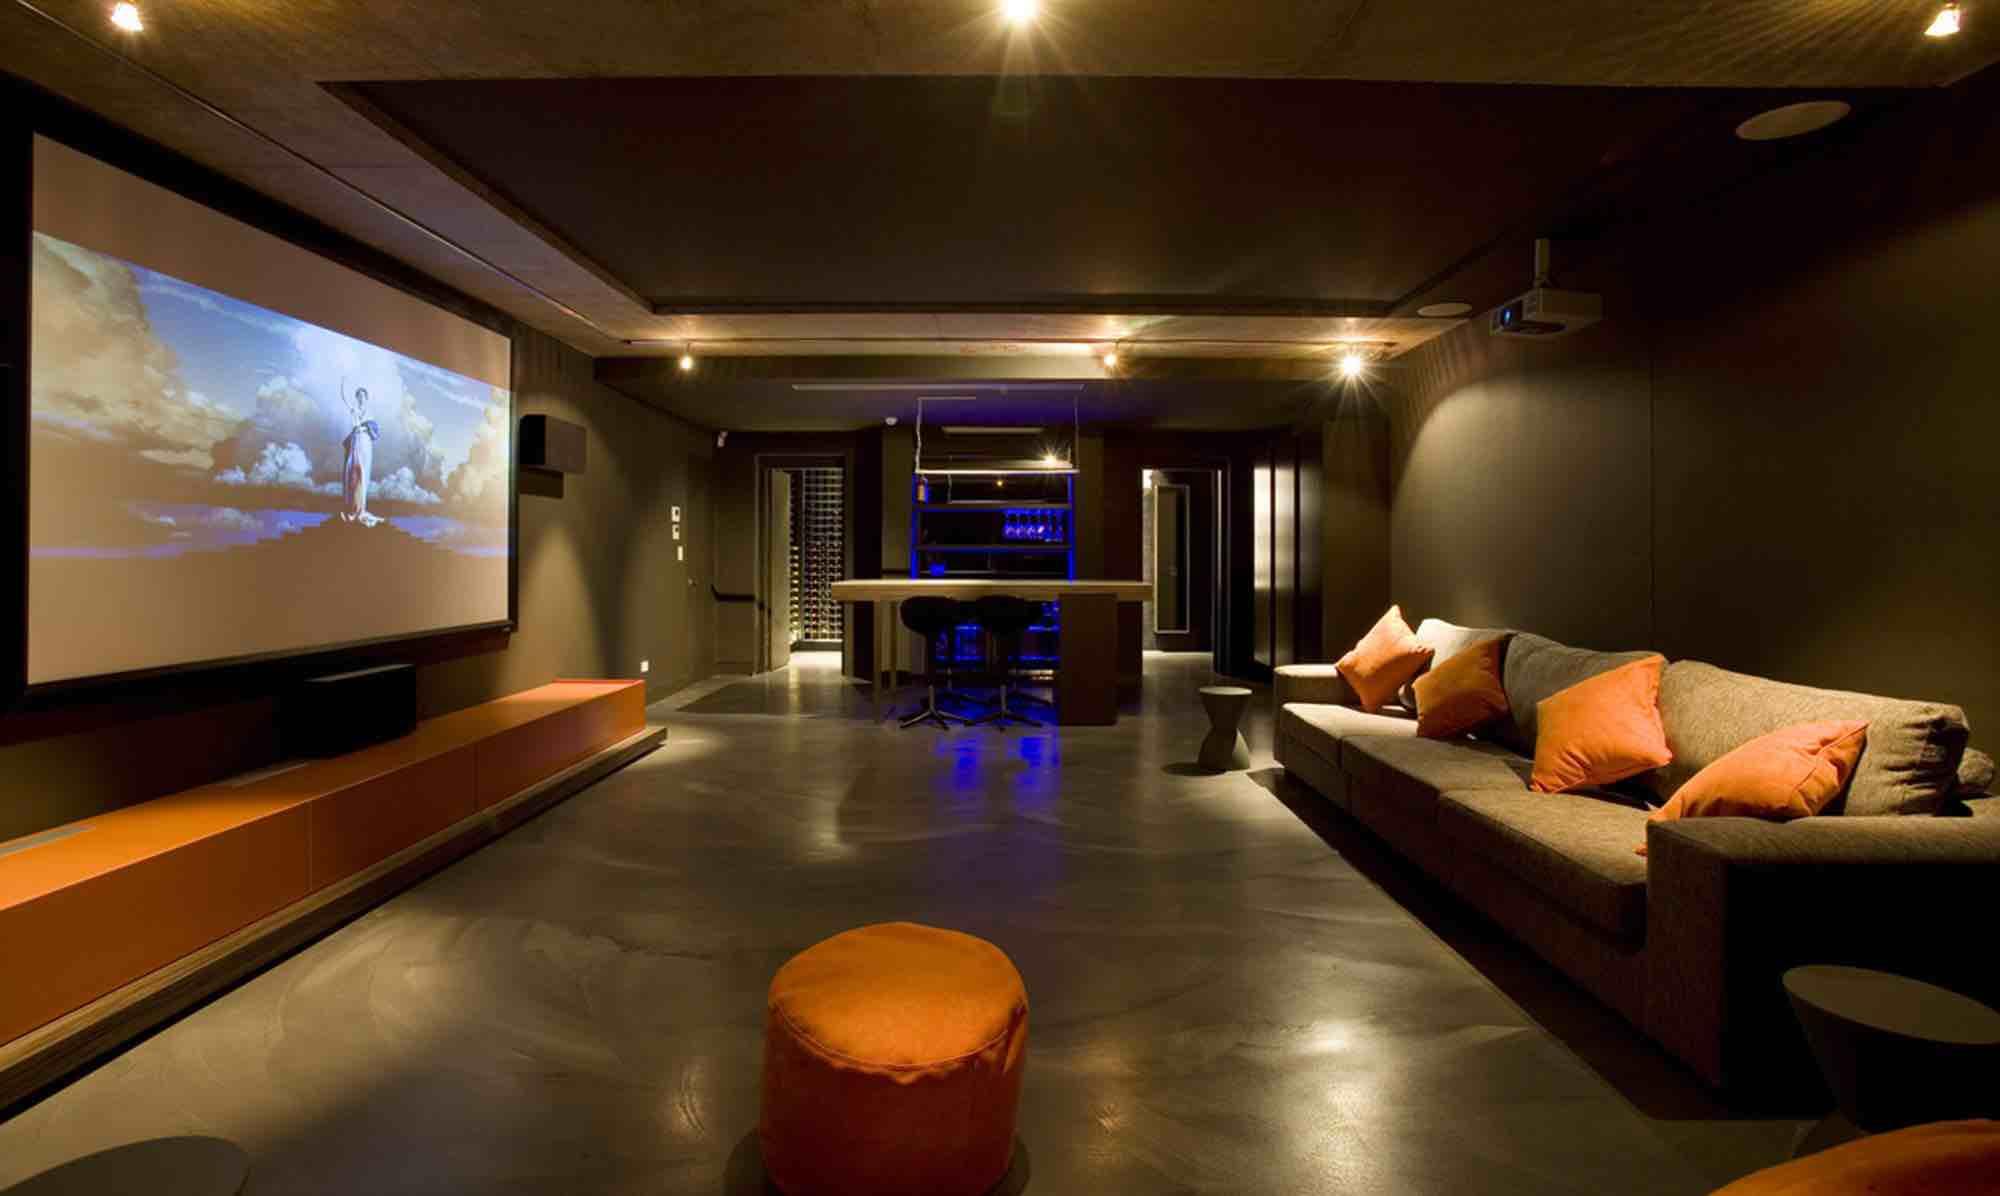 minosa-design-home-theatre-design-dark-kitchenette-led-exposed-orange-concrete-0